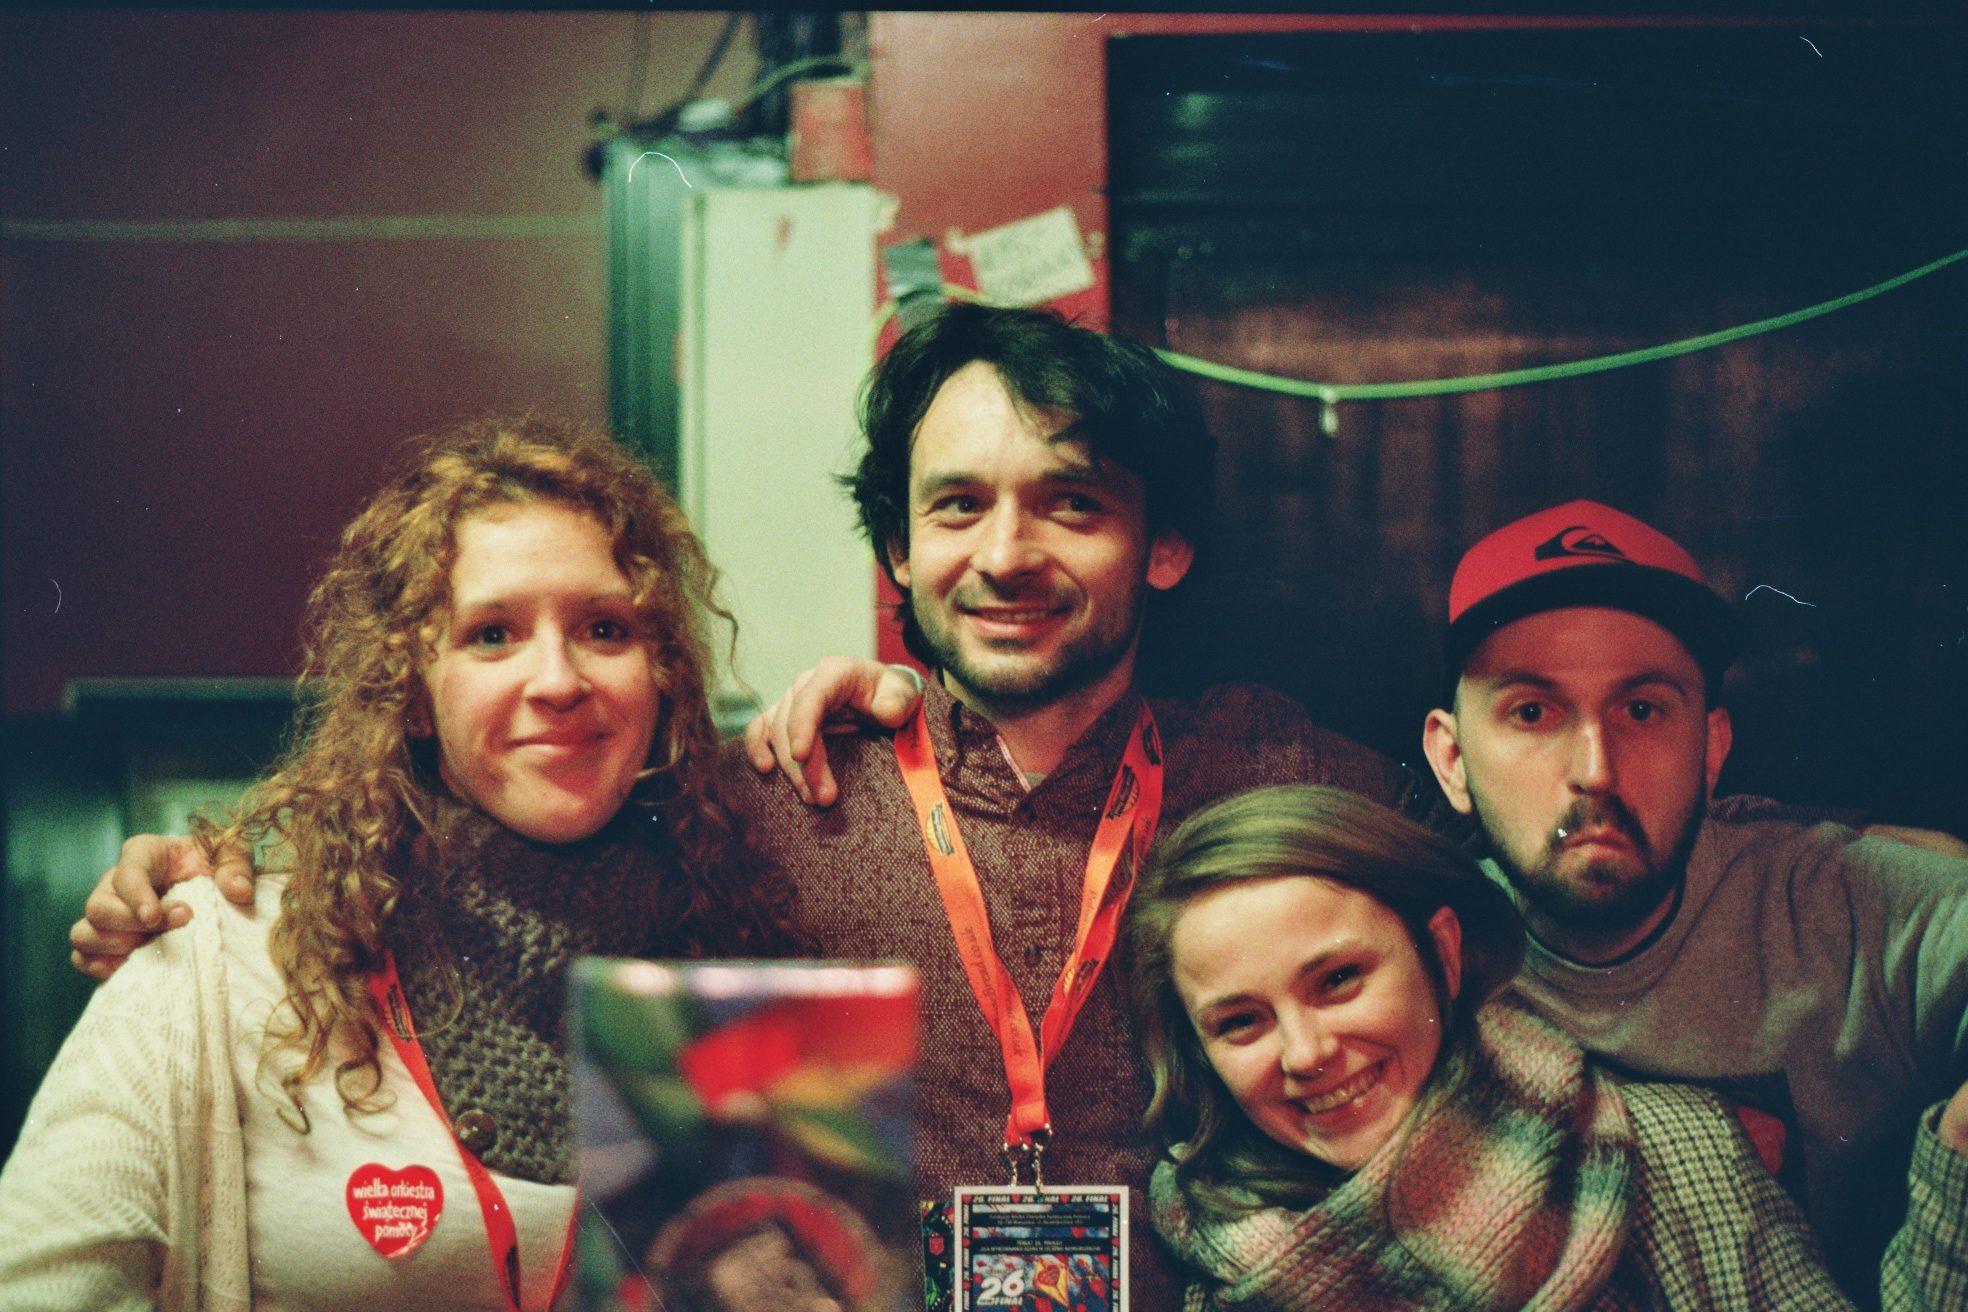 Volunteers at the GOCC final in London in 2018. Maude, from Spain, on the left. Fot. Bartosz Kielak